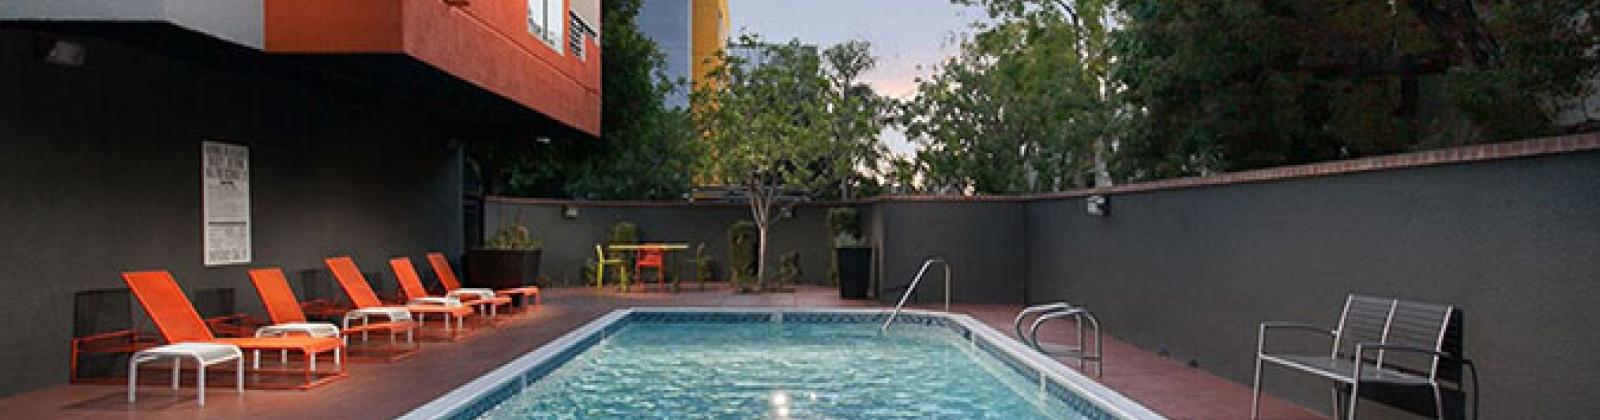 poolside recreation